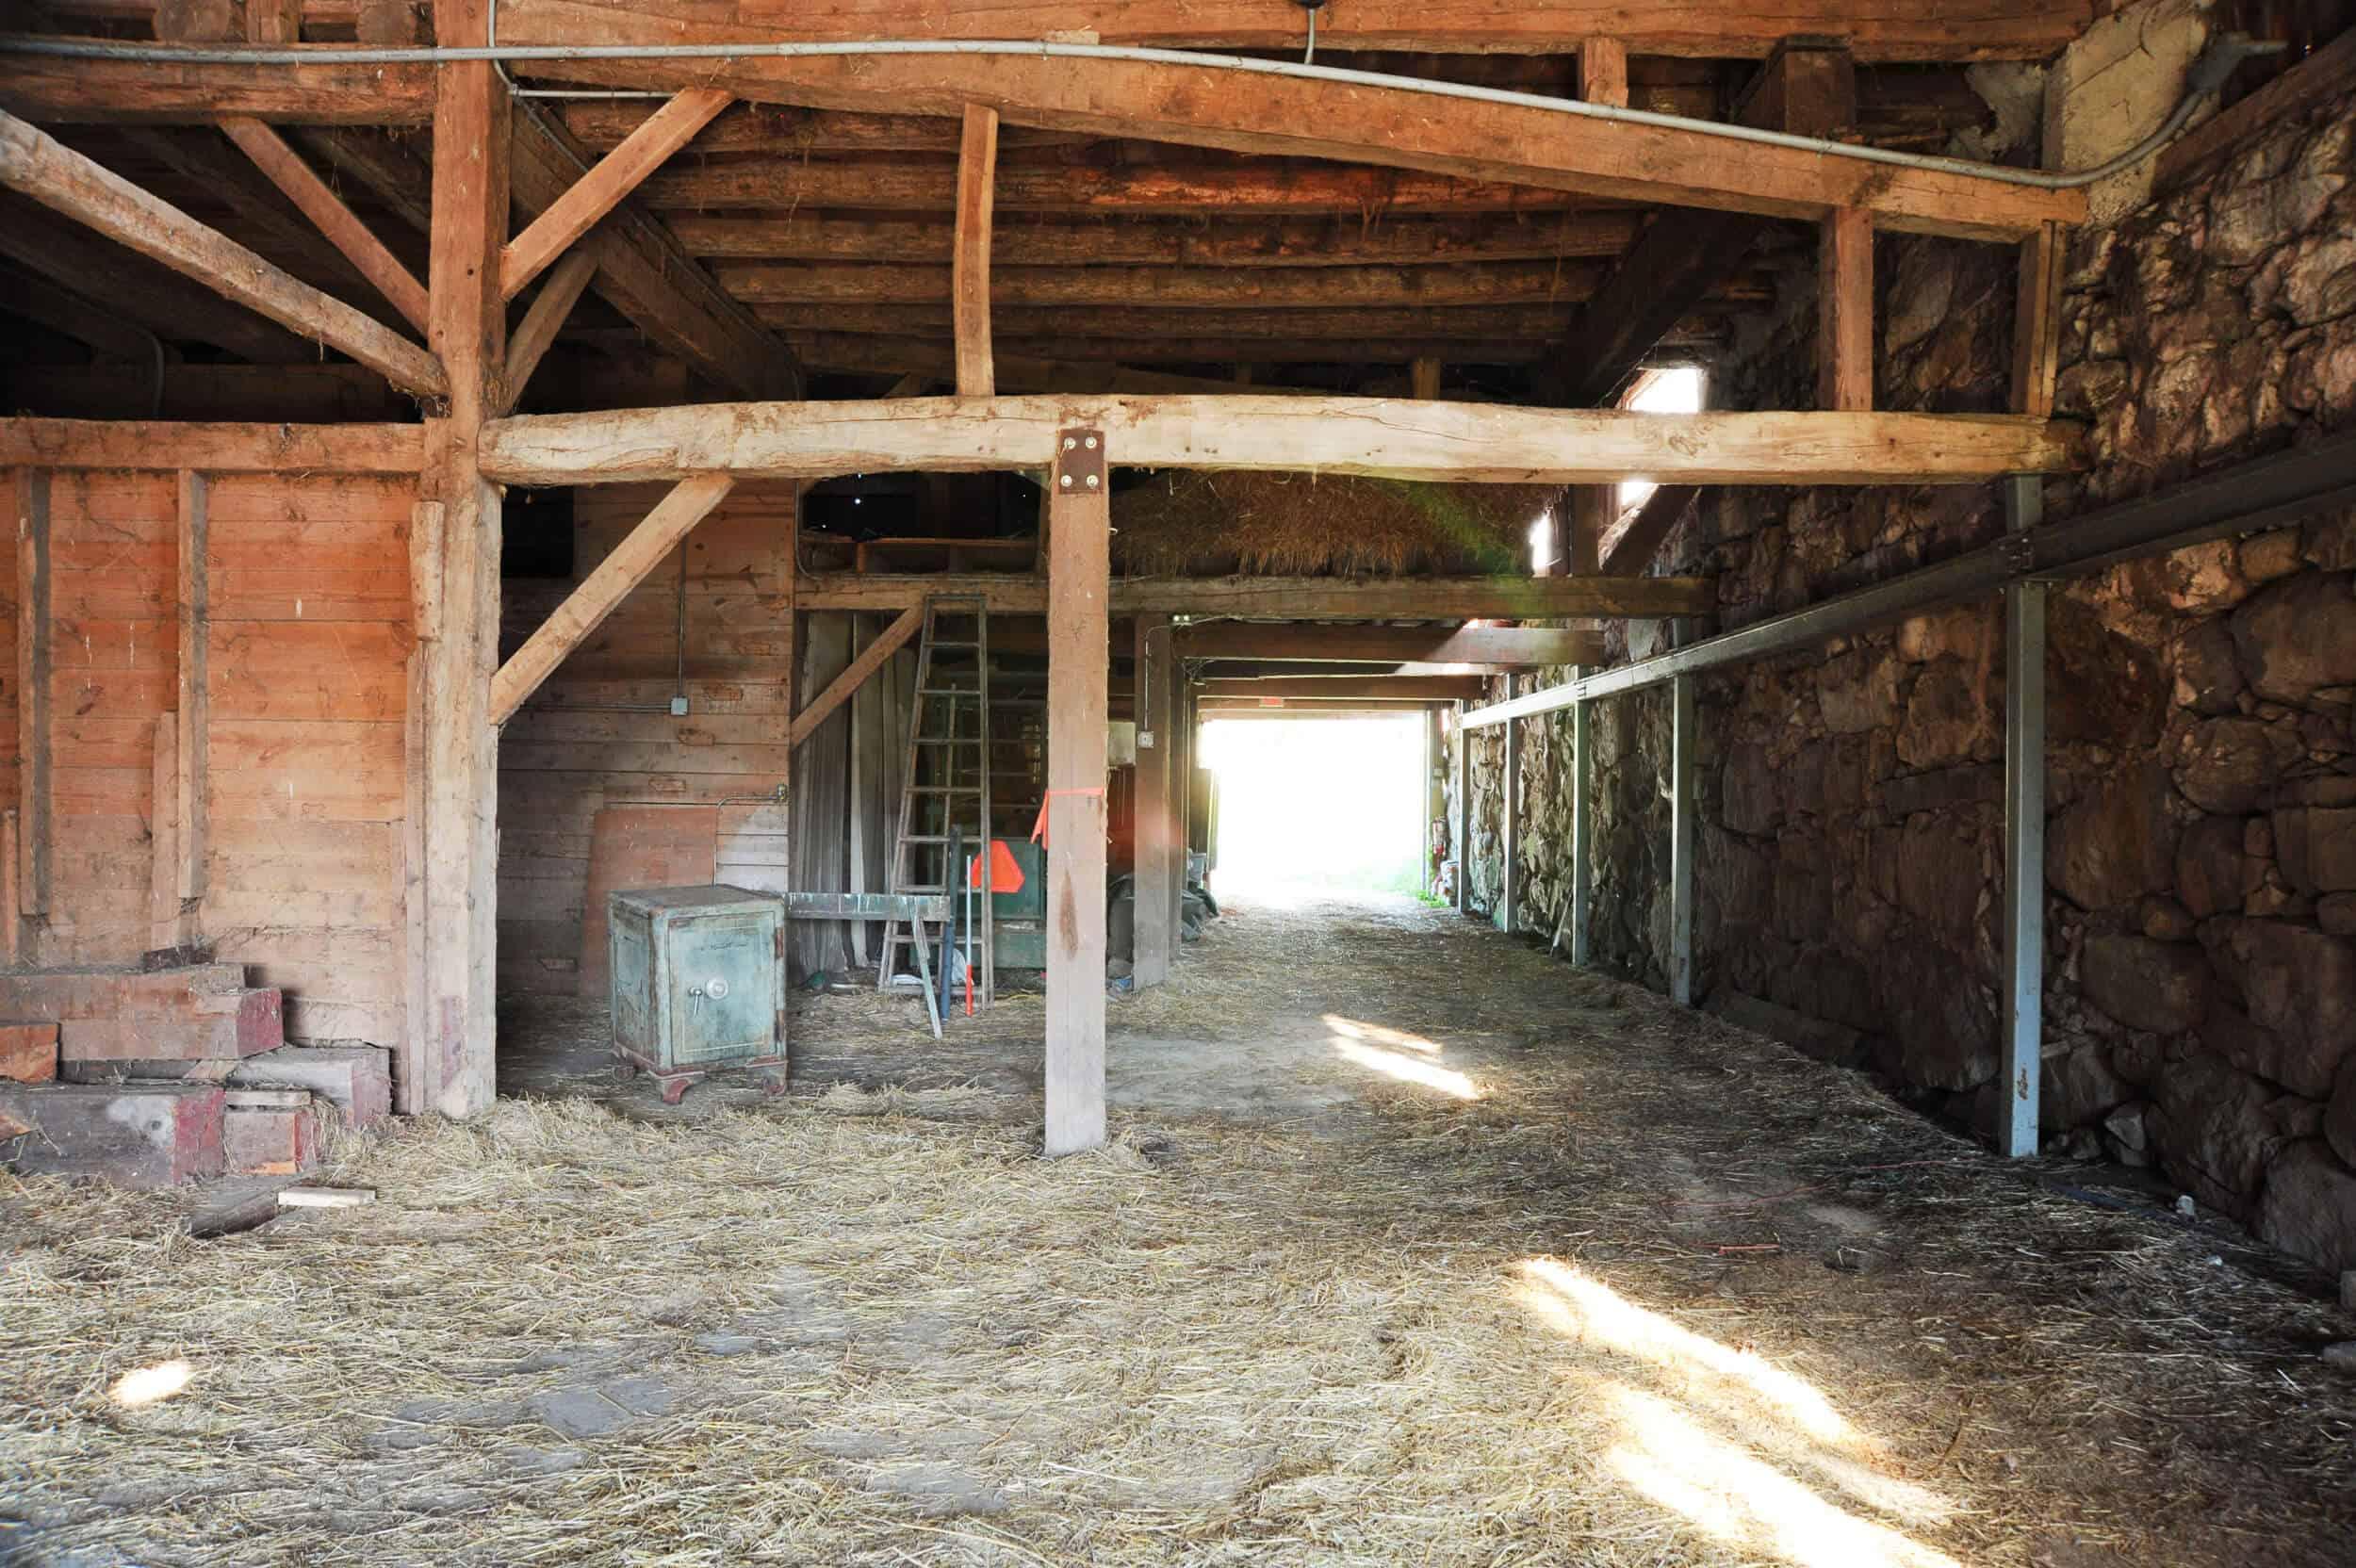 Henderson Samsung The Frame Louise Roe The Barn 28